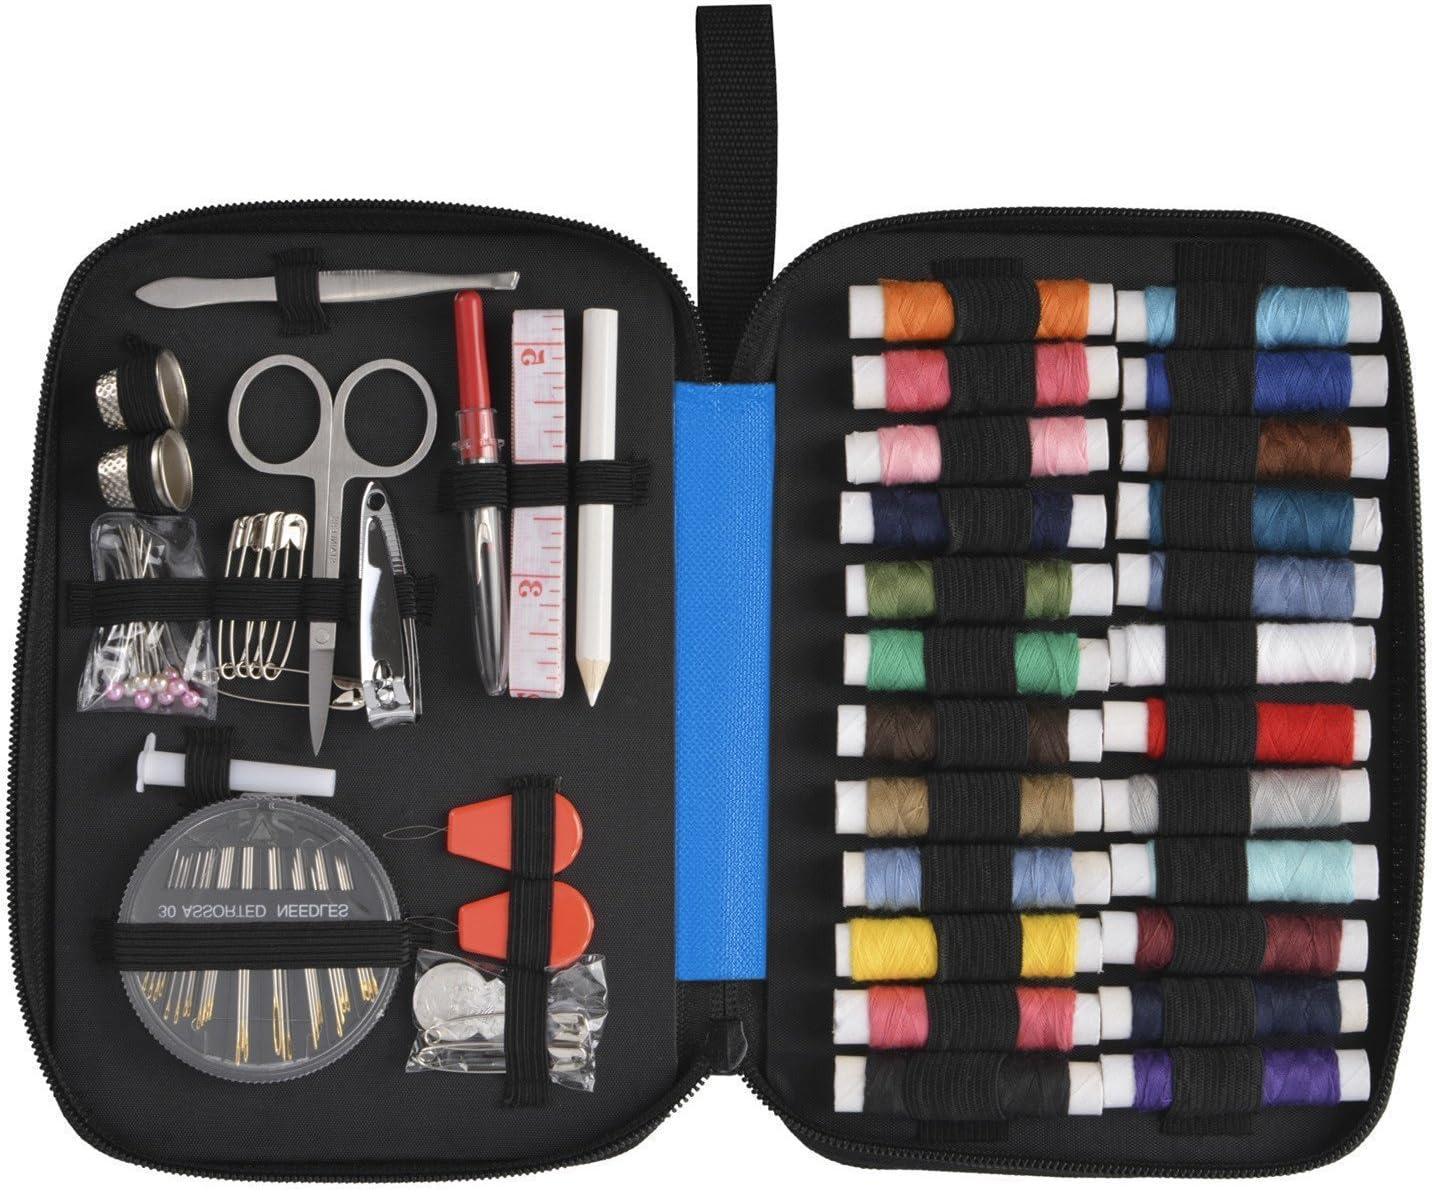 Nestron - Kit de costura con 90 accesorios + estuche de tela Oxford de alta calidad para principiantes o para viajar - Color: azul: Amazon.es: Hogar